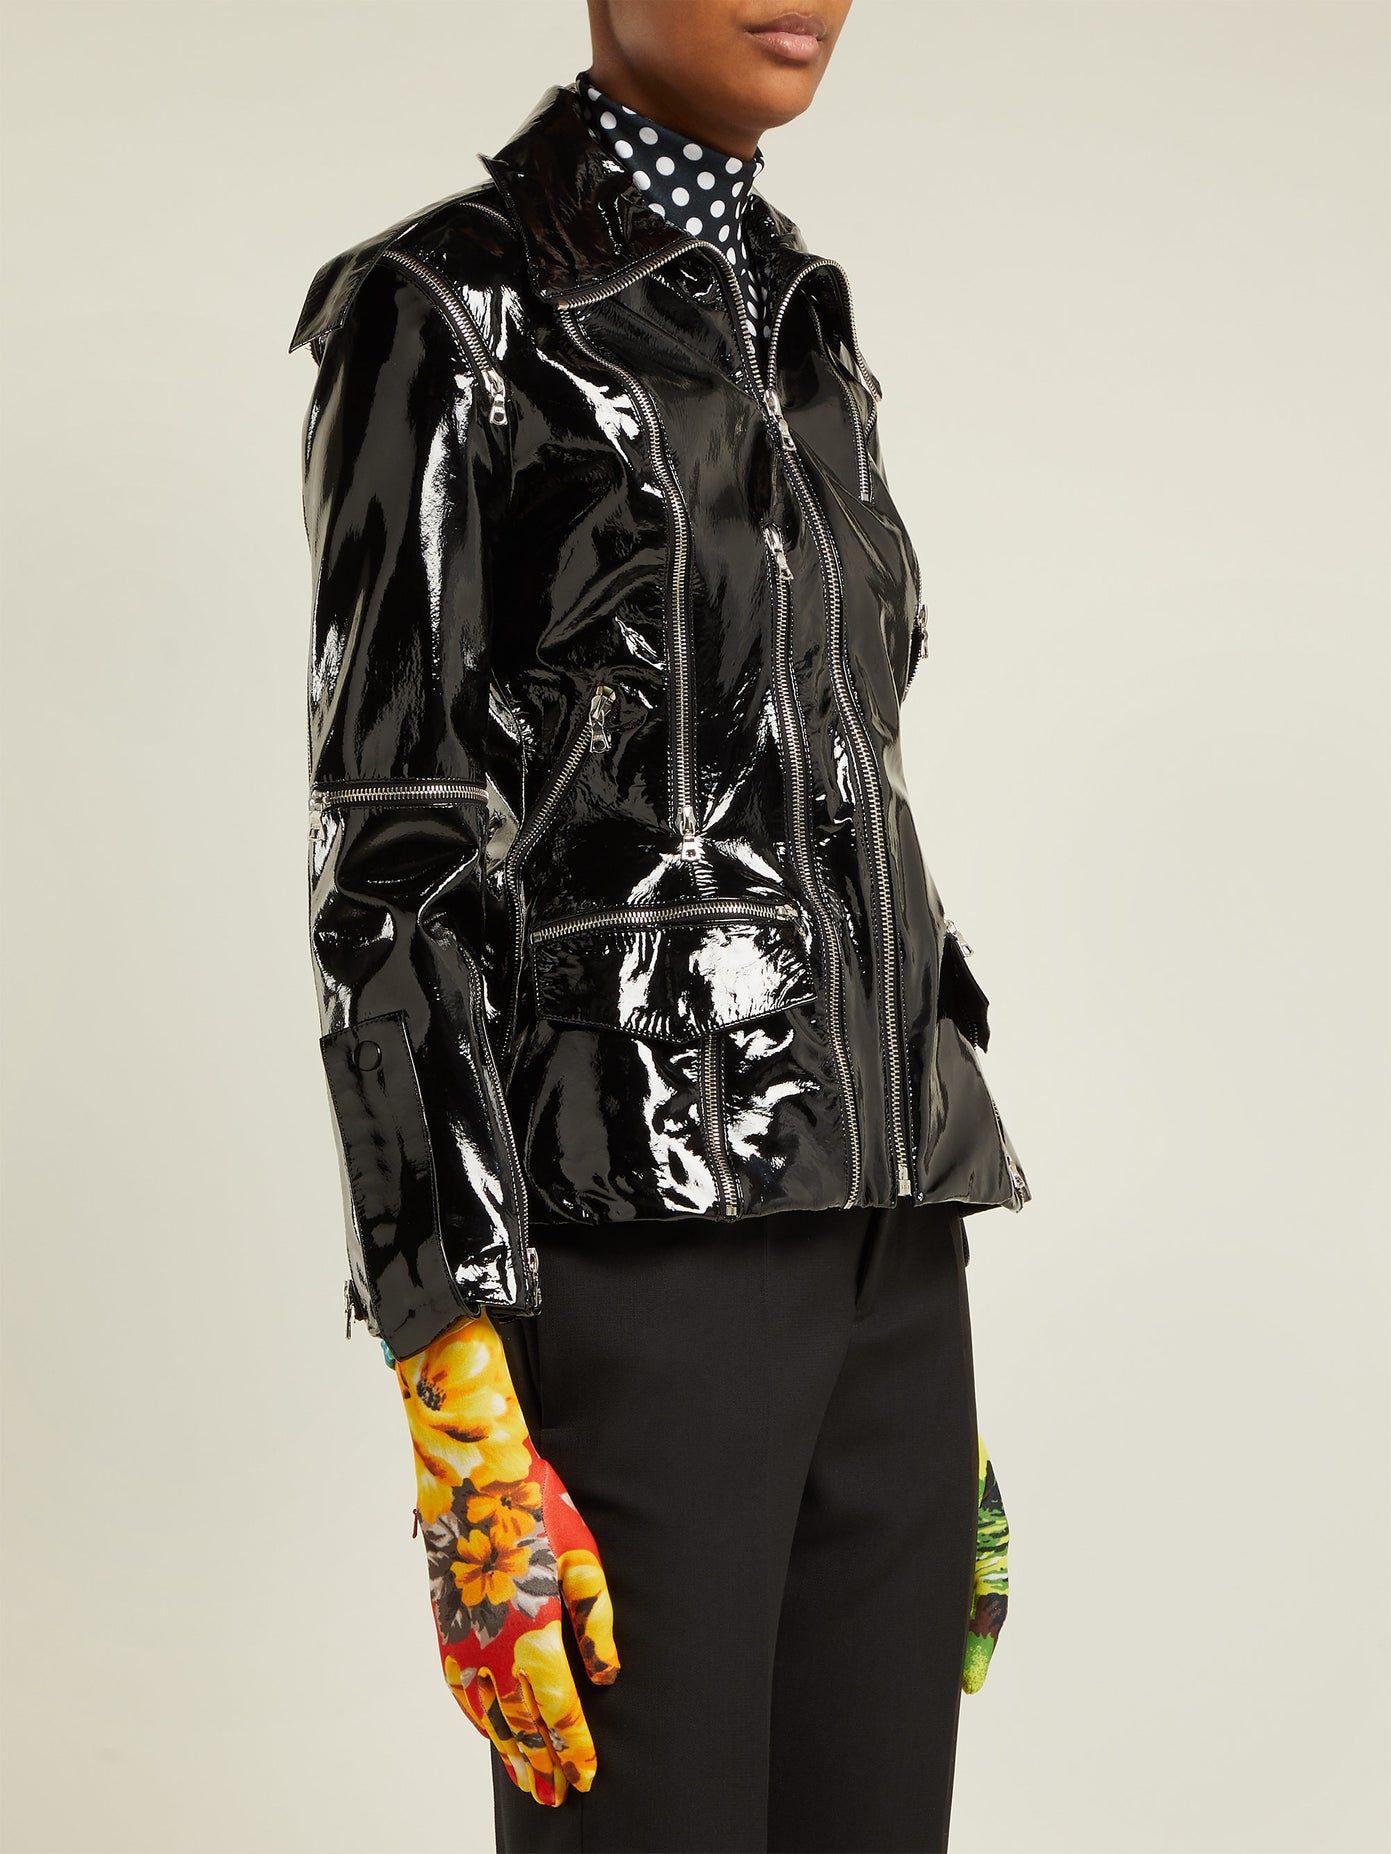 Zipembellished patentleather jacket Richard Quinn